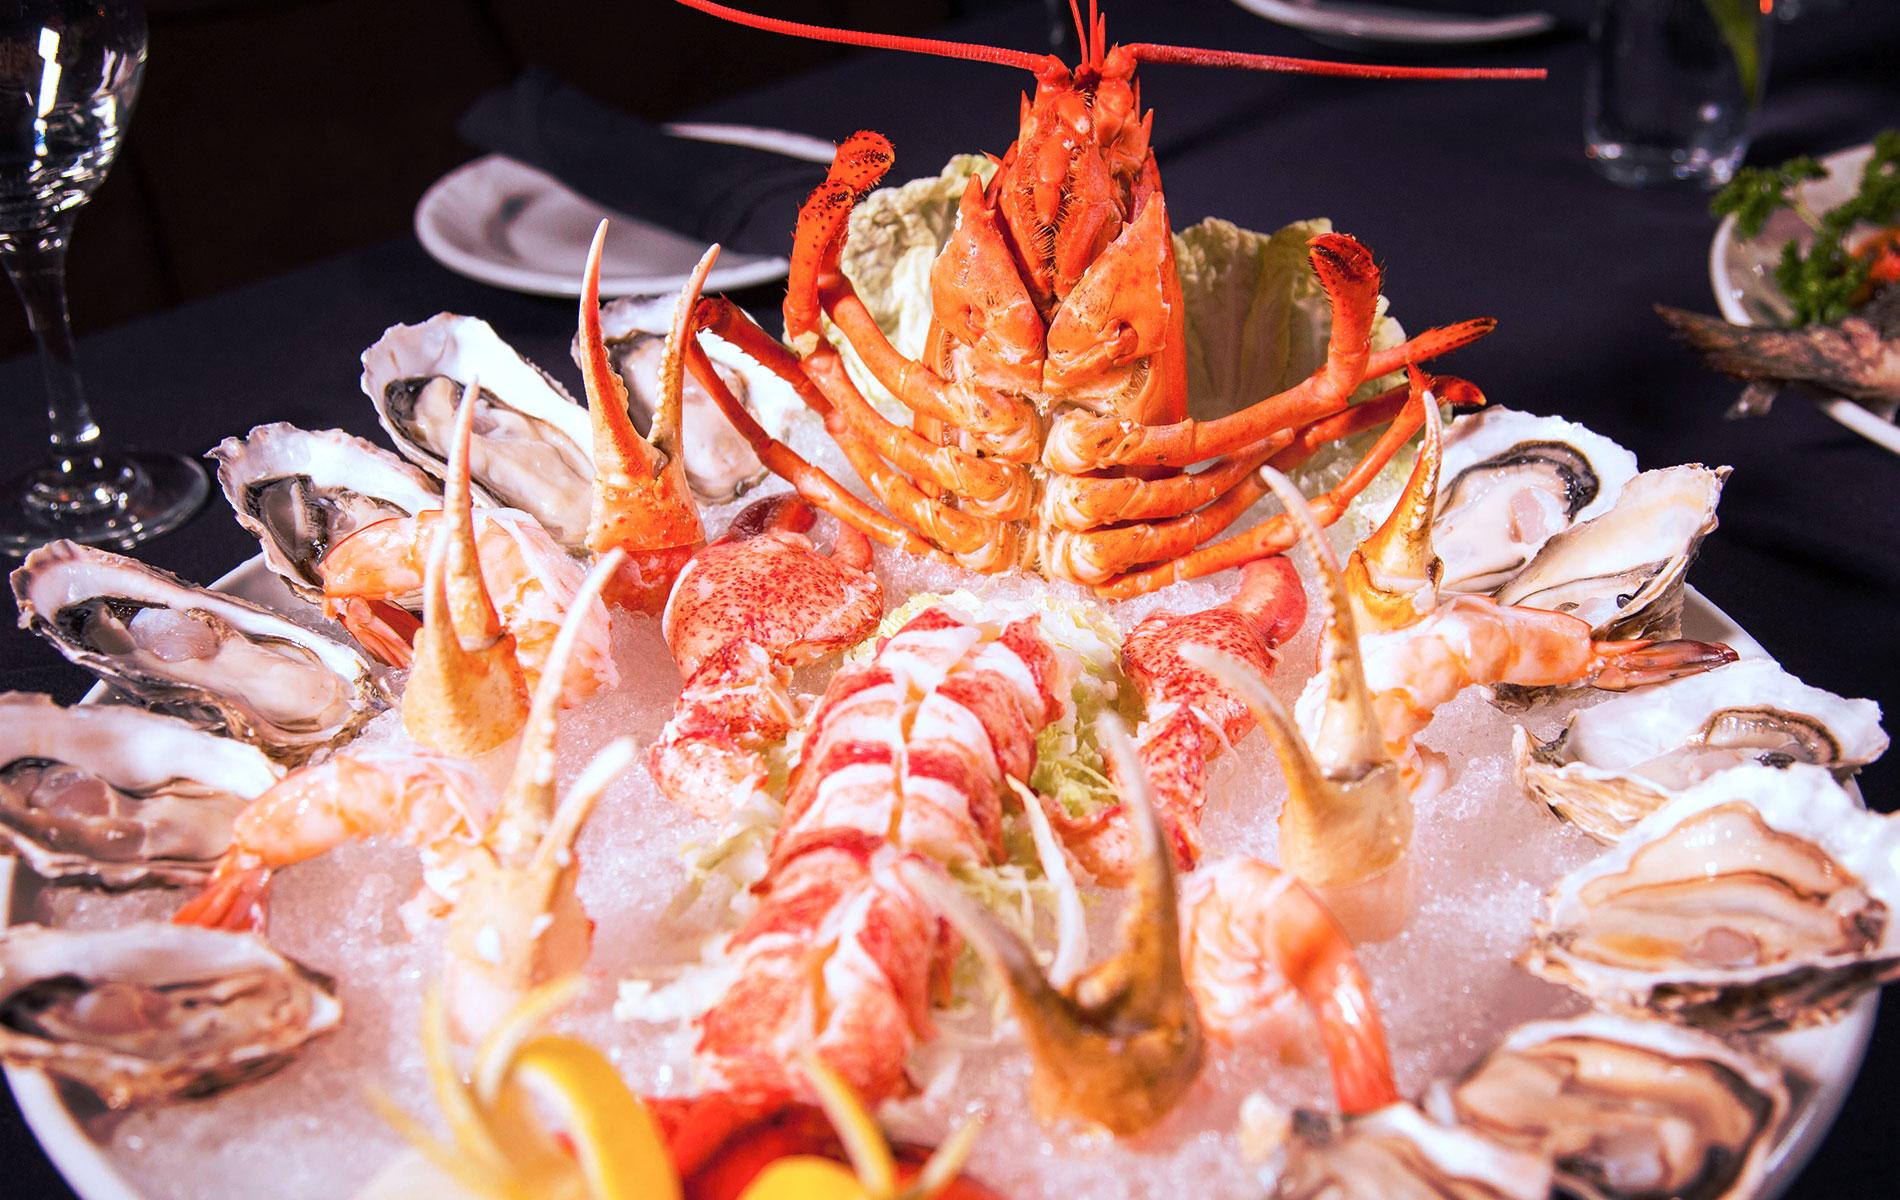 Zin-Bistro-7_Chilled-Seafood-Platter-1900x1200